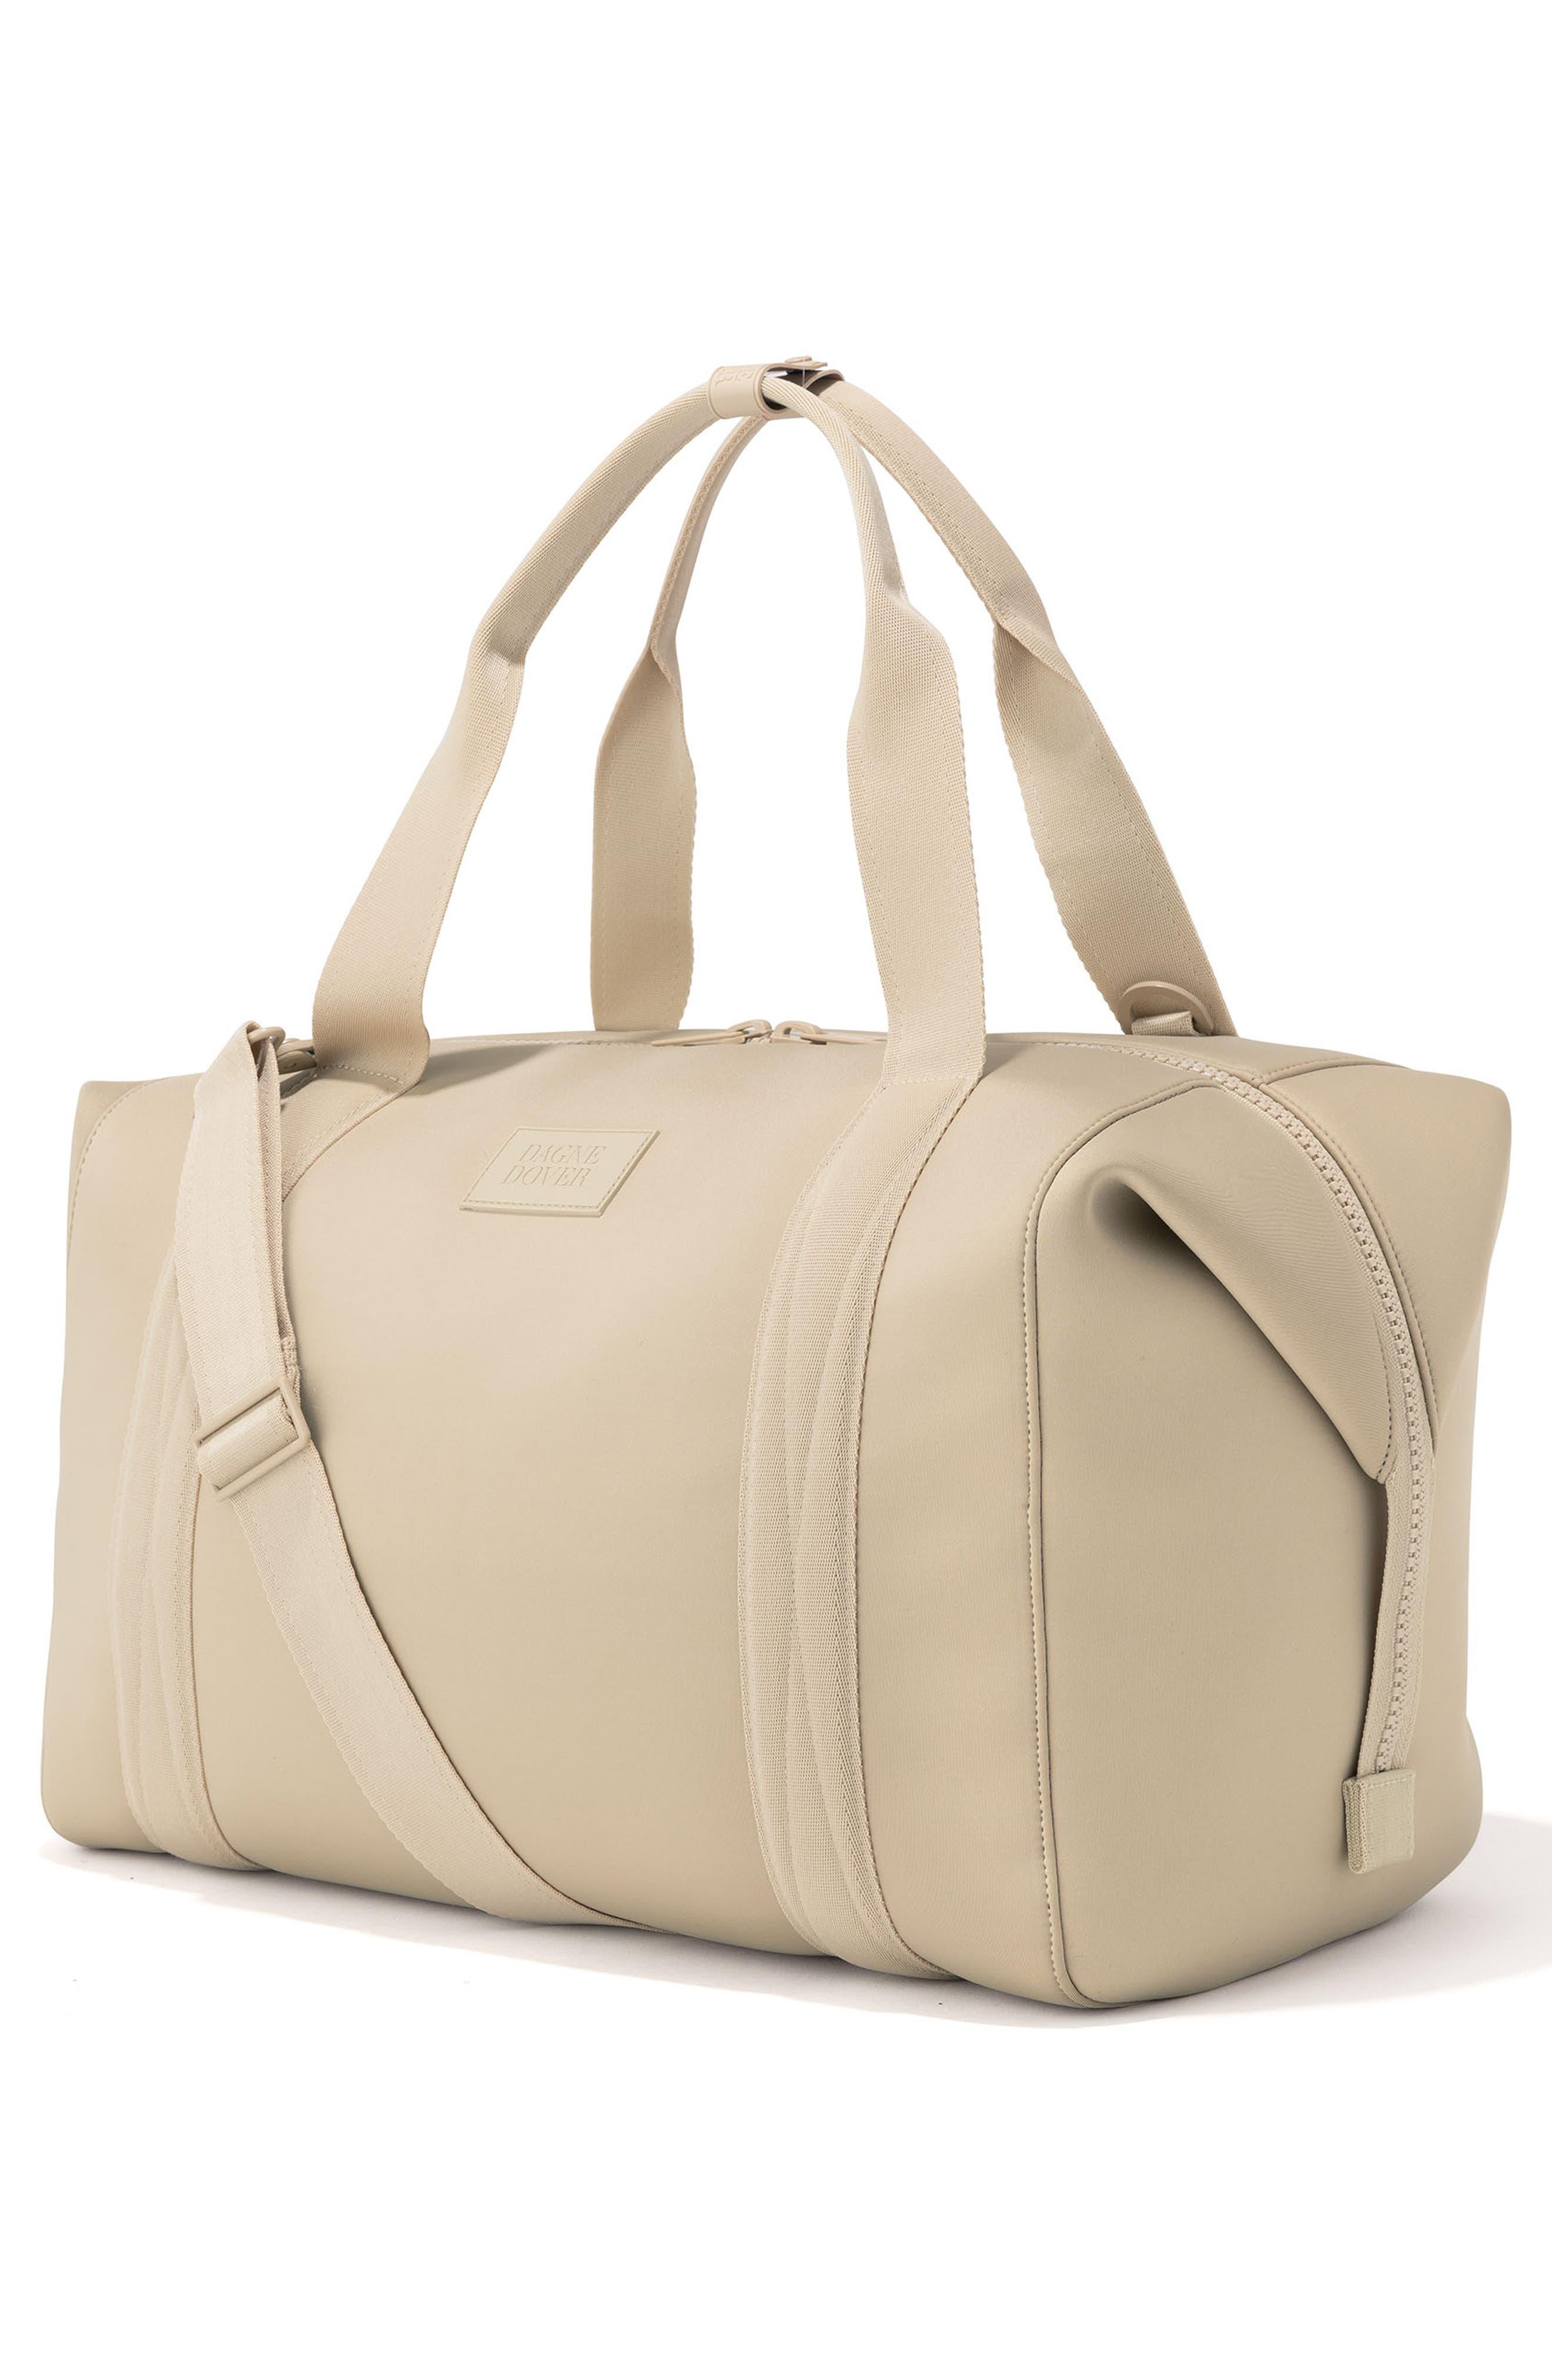 DAGNE DOVER, XL Landon Carryall Duffle Bag, Alternate thumbnail 4, color, ALMOND LATTE